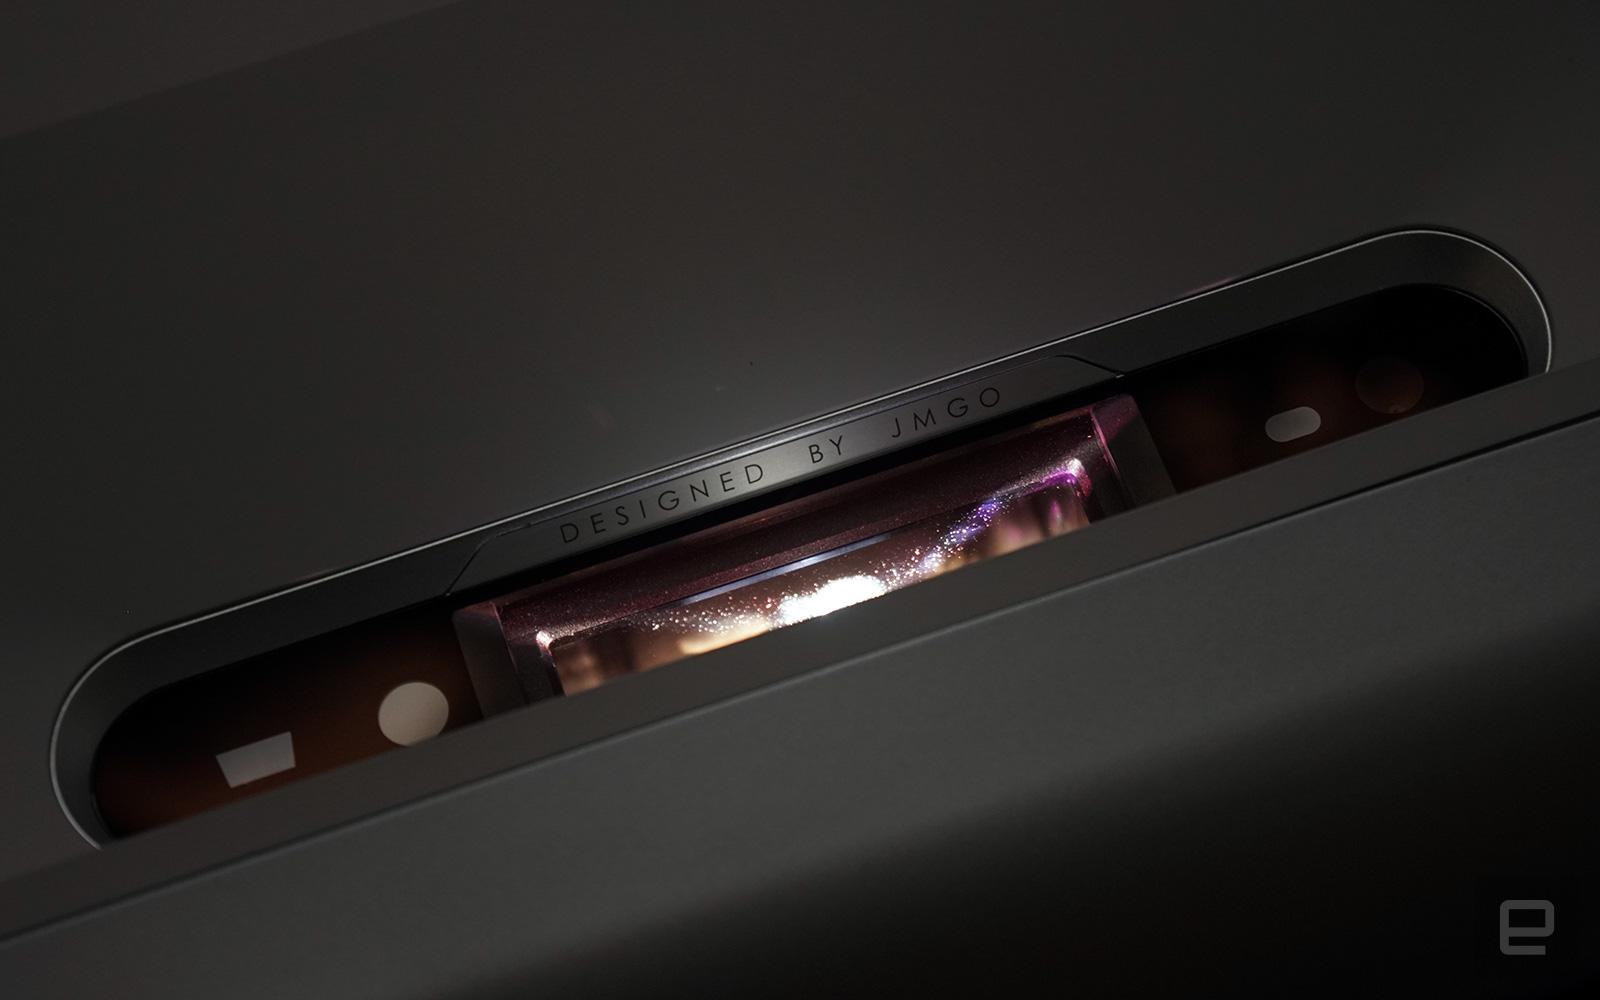 <p>JMGO O1 ultra-short throw LED projector</p>